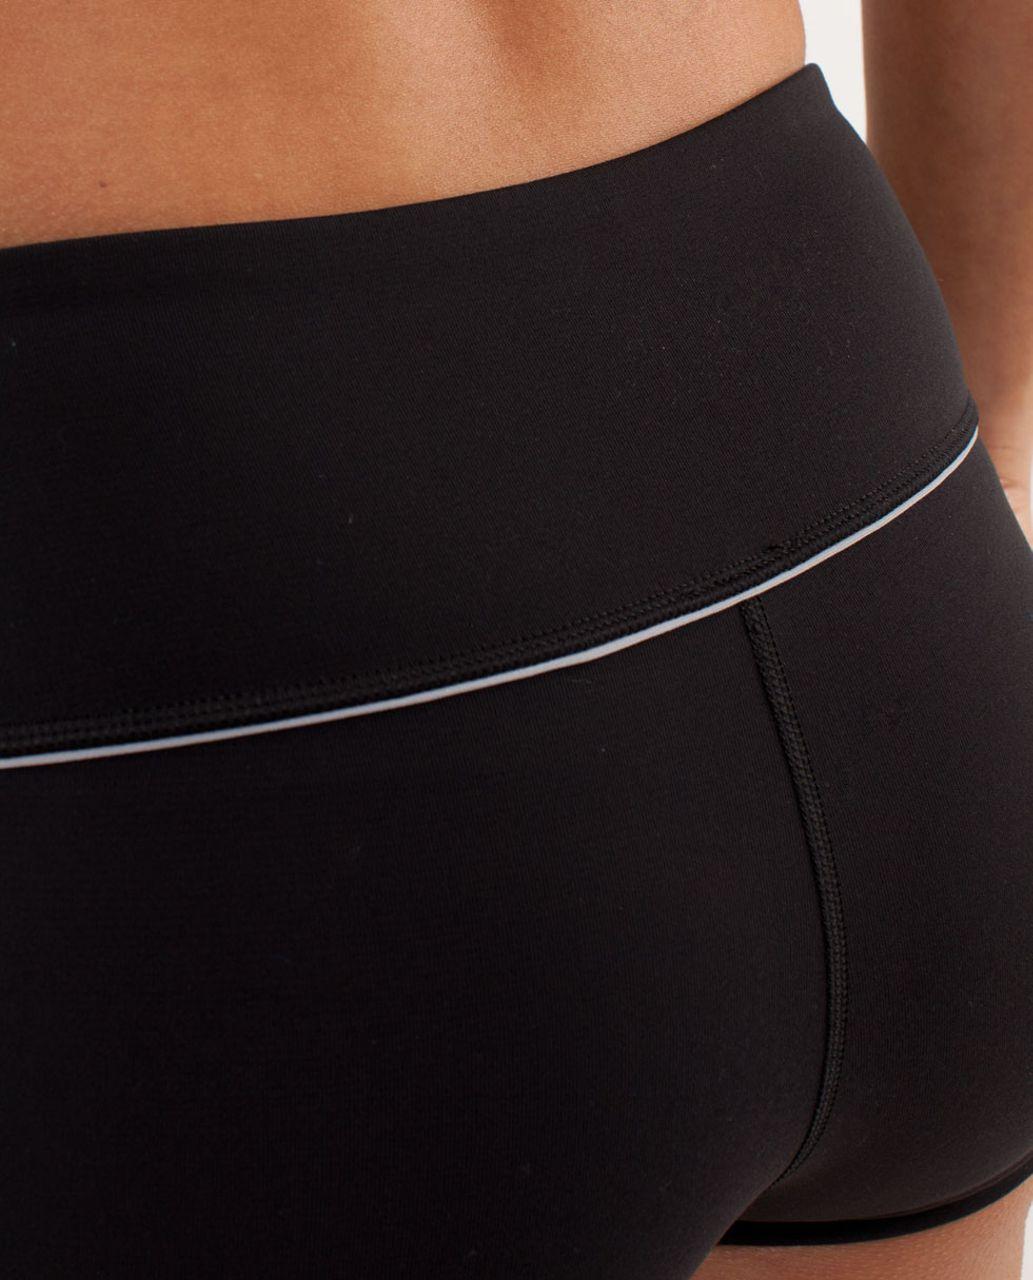 Lululemon Boogie Short *Silver - Black / Silver Slate